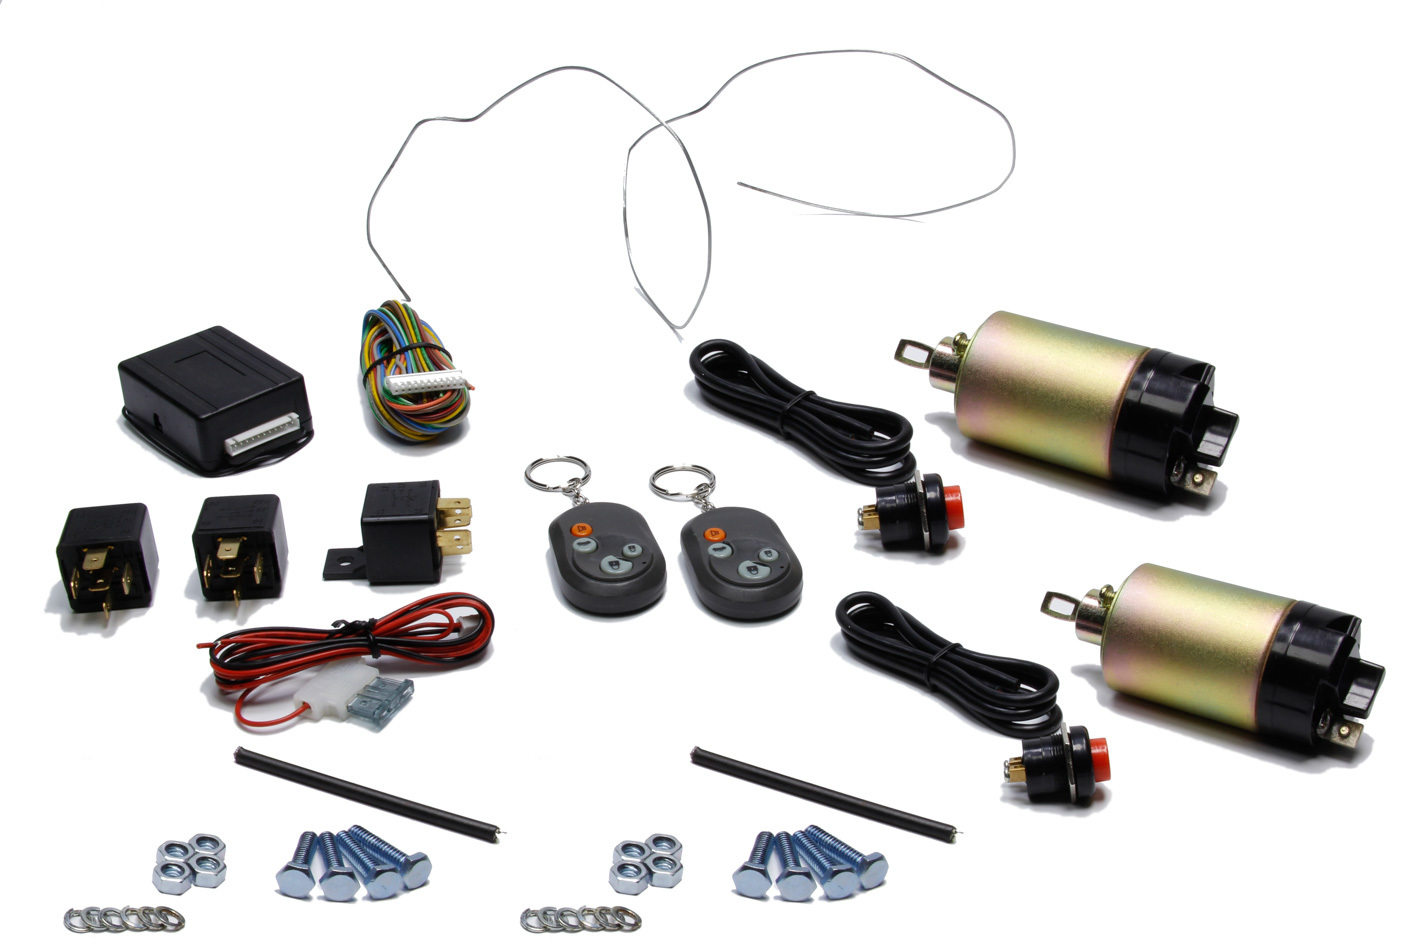 Auto-loc 2 Door Remote Shaved Handle Kit 15lb Solen.